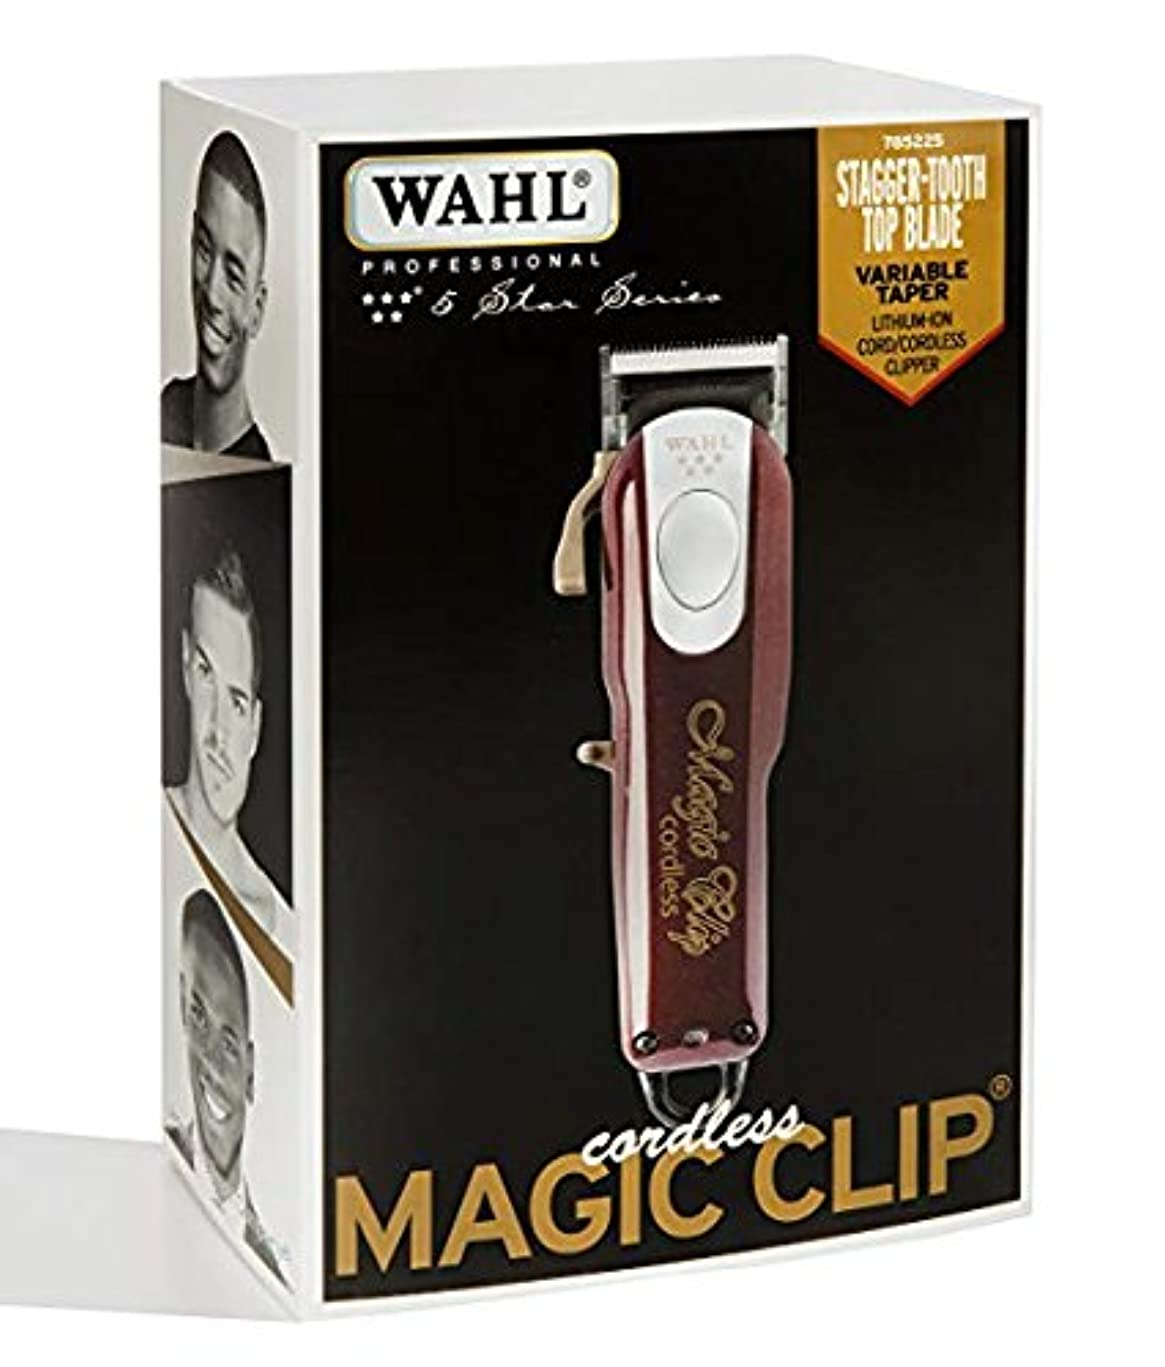 [Wahl] [すばらしいです 専用 理髪店とスタイリスト - 90分以上の実行時間 / Professional 5-Star Cord/Cordless Magic Clip #8148] (並行輸入品)